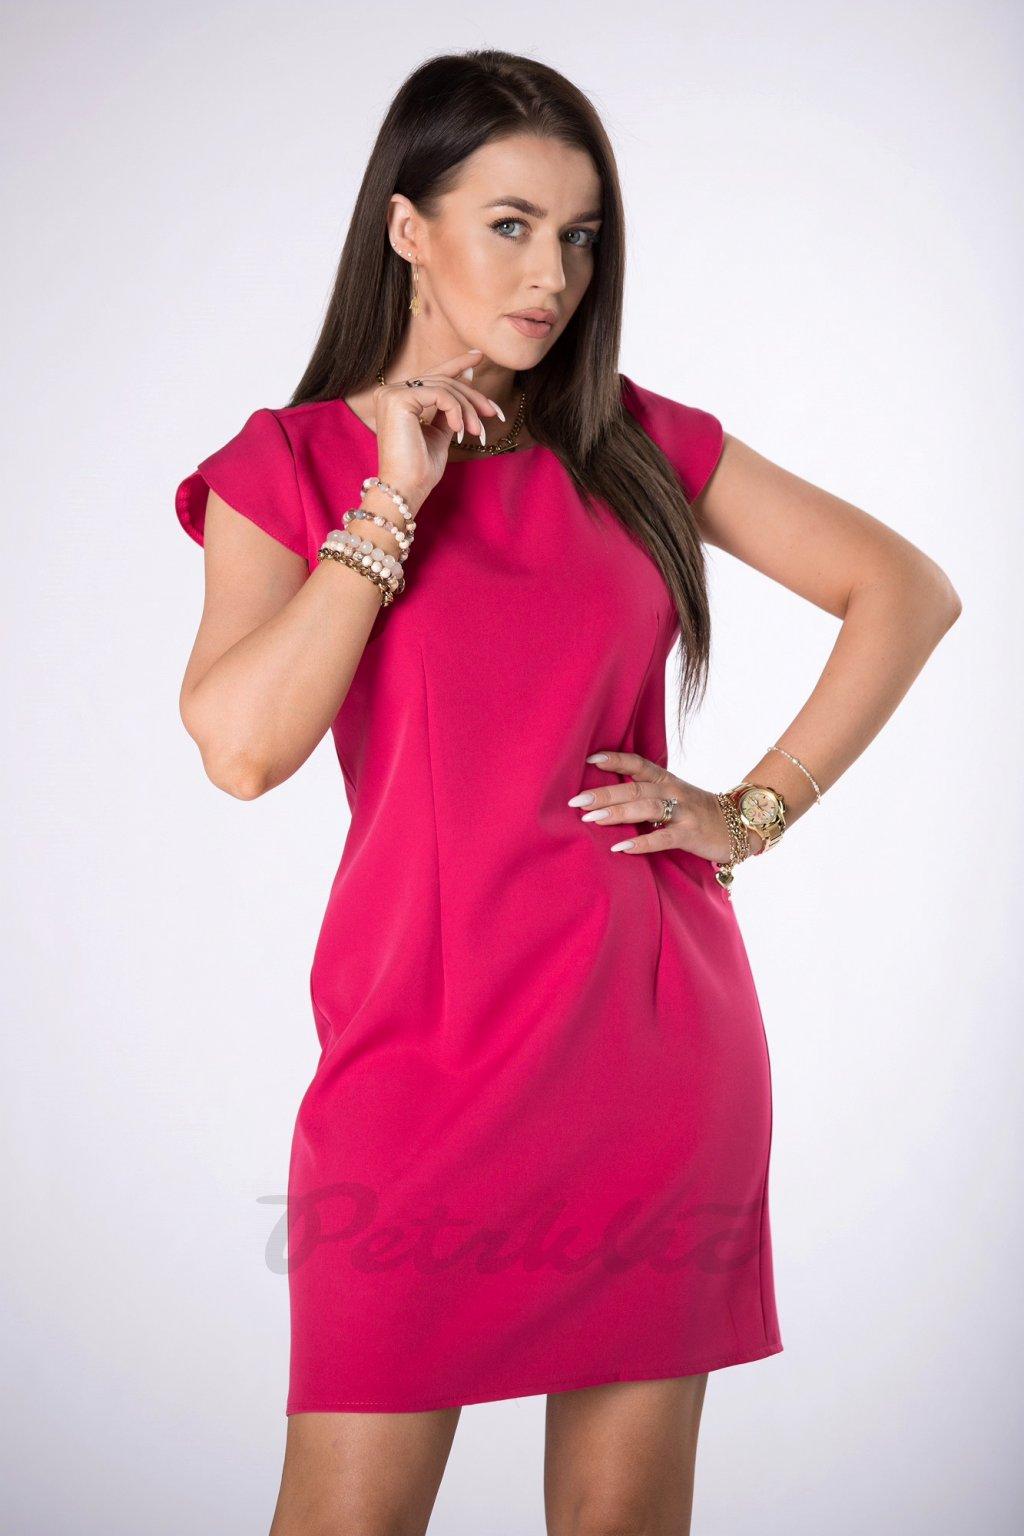 Šaty s krátkým rukávem - růžové QMM84395